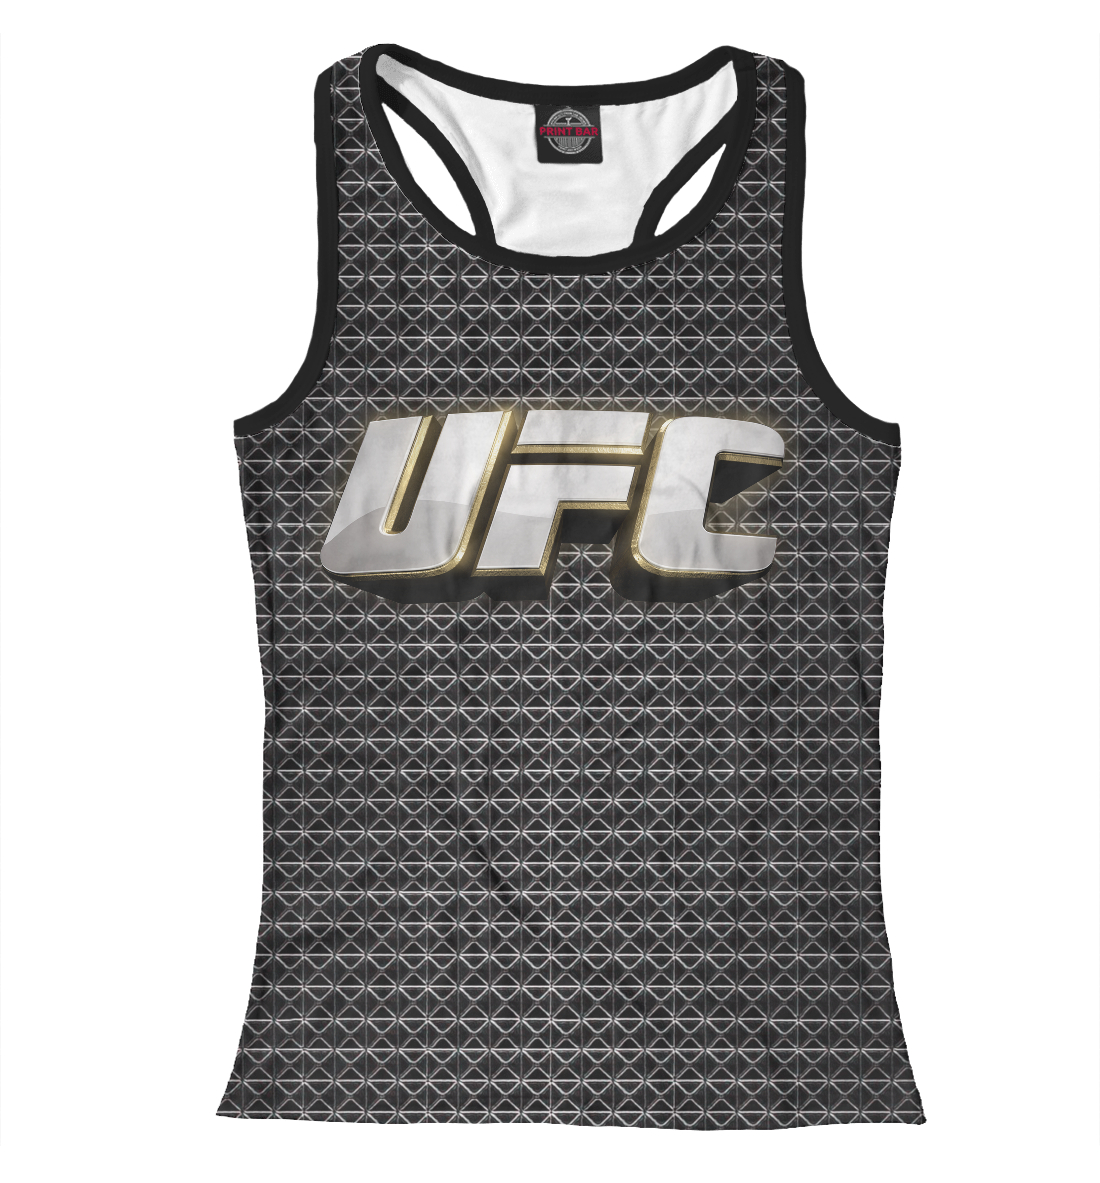 Купить UFC logo, Printbar, Майки борцовки, MNU-582544-mayb-1